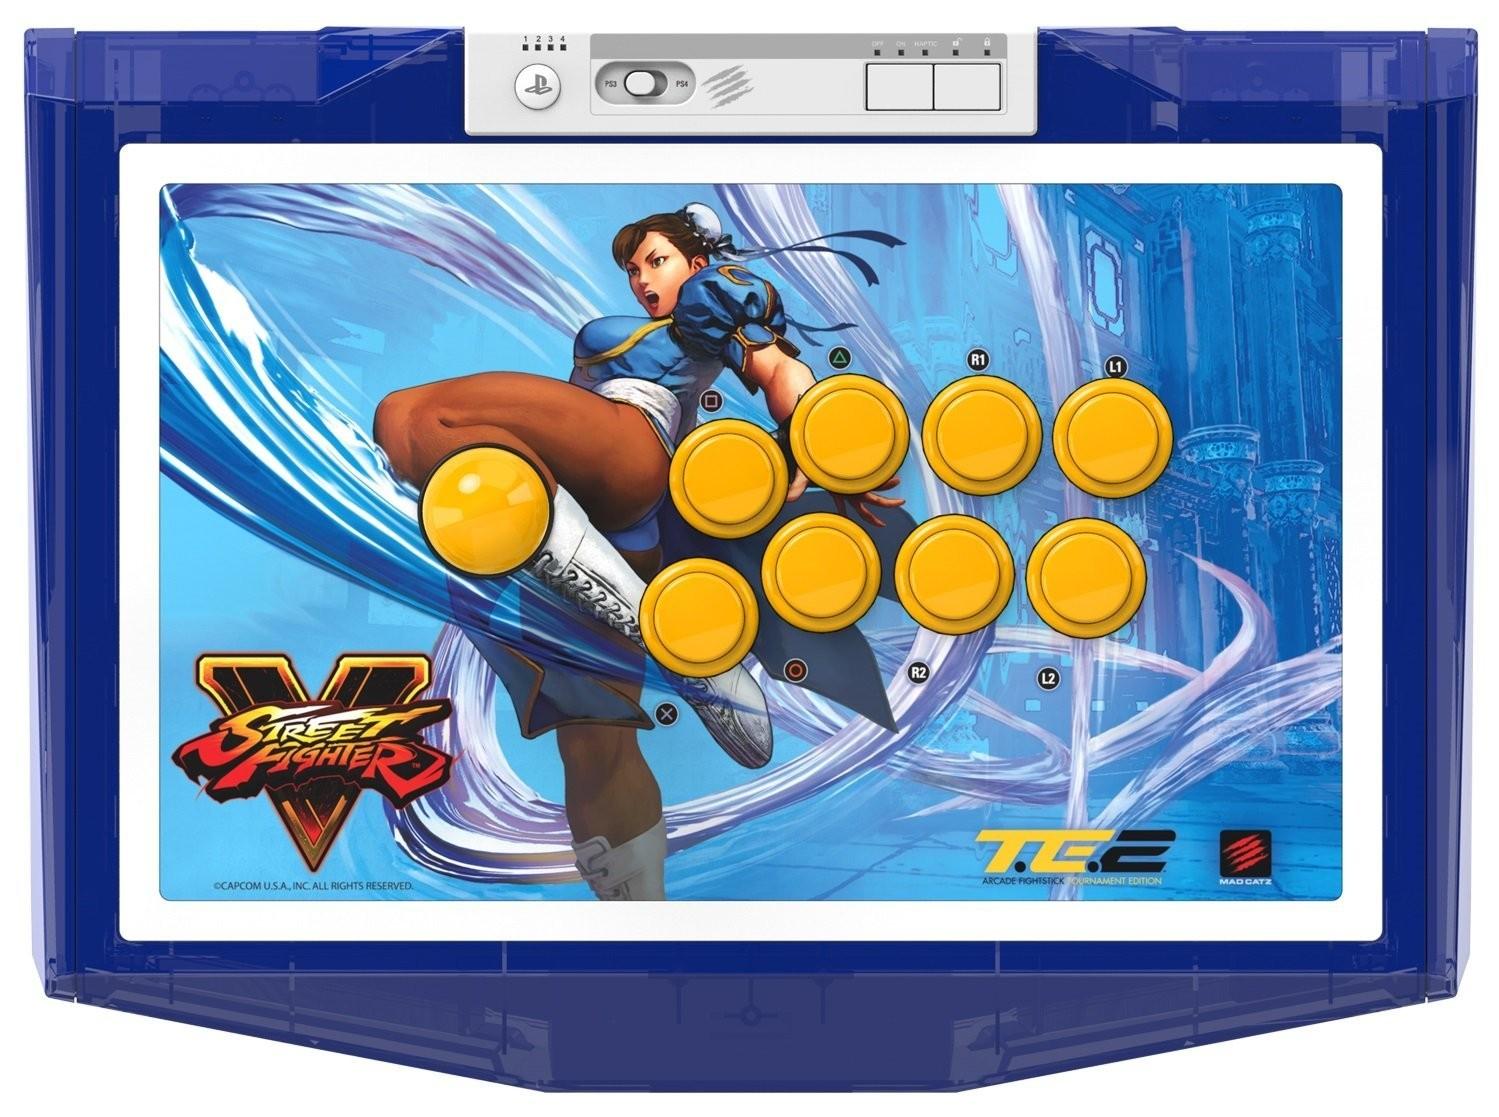 Mad Catz MCS-FS-SFV-TE2-CHL PS3 / PS4 Street Fighter V Arcade